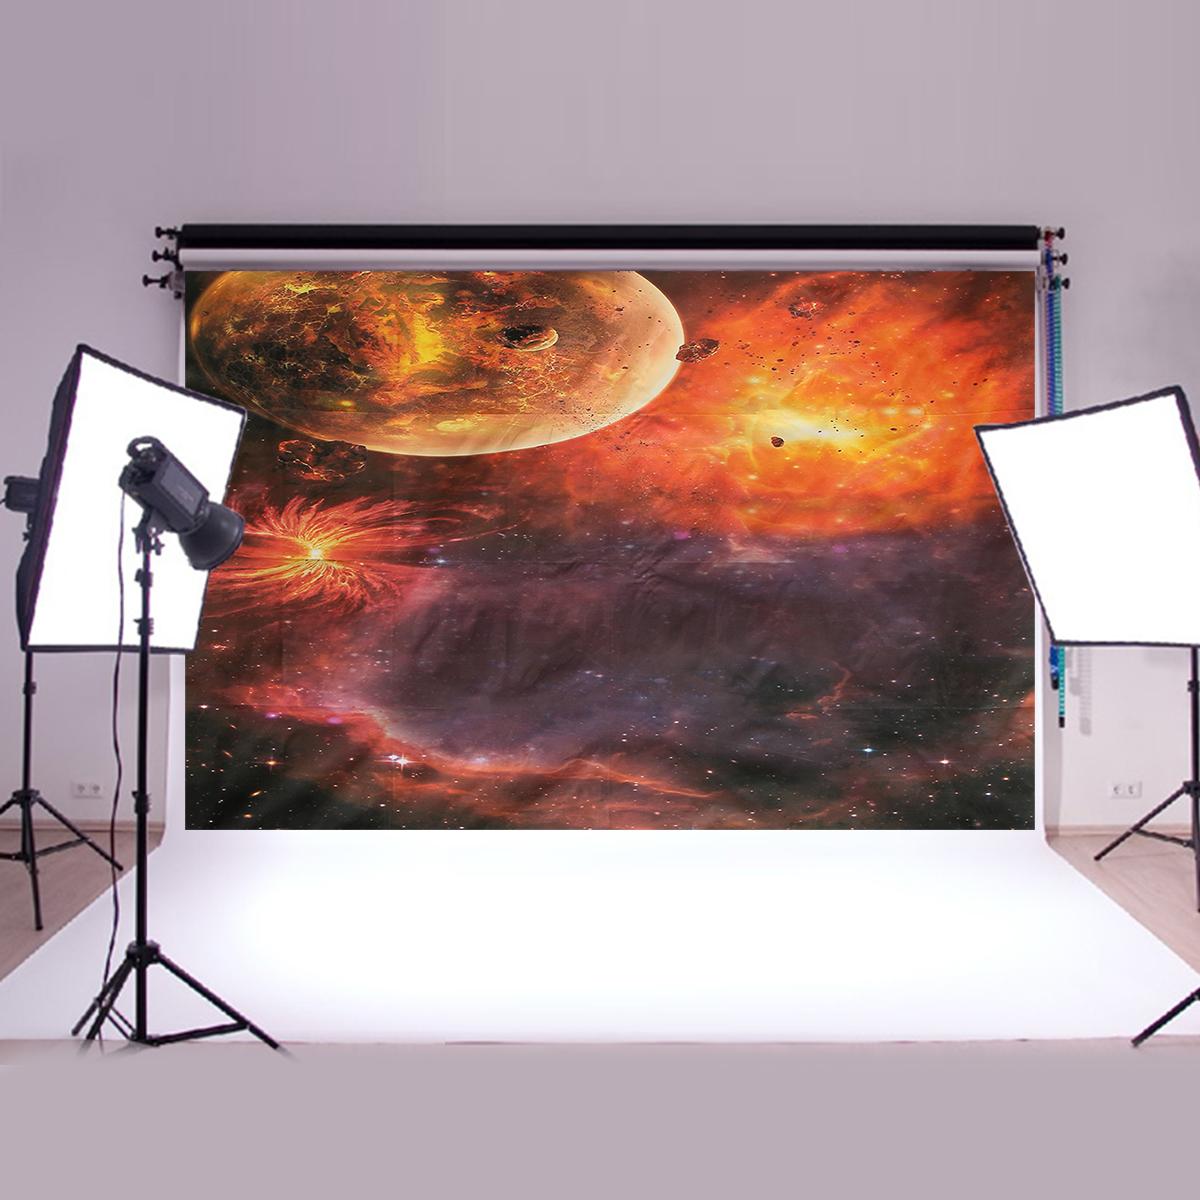 sternenhimmel weltraum 1m hintergrund fotostudio. Black Bedroom Furniture Sets. Home Design Ideas